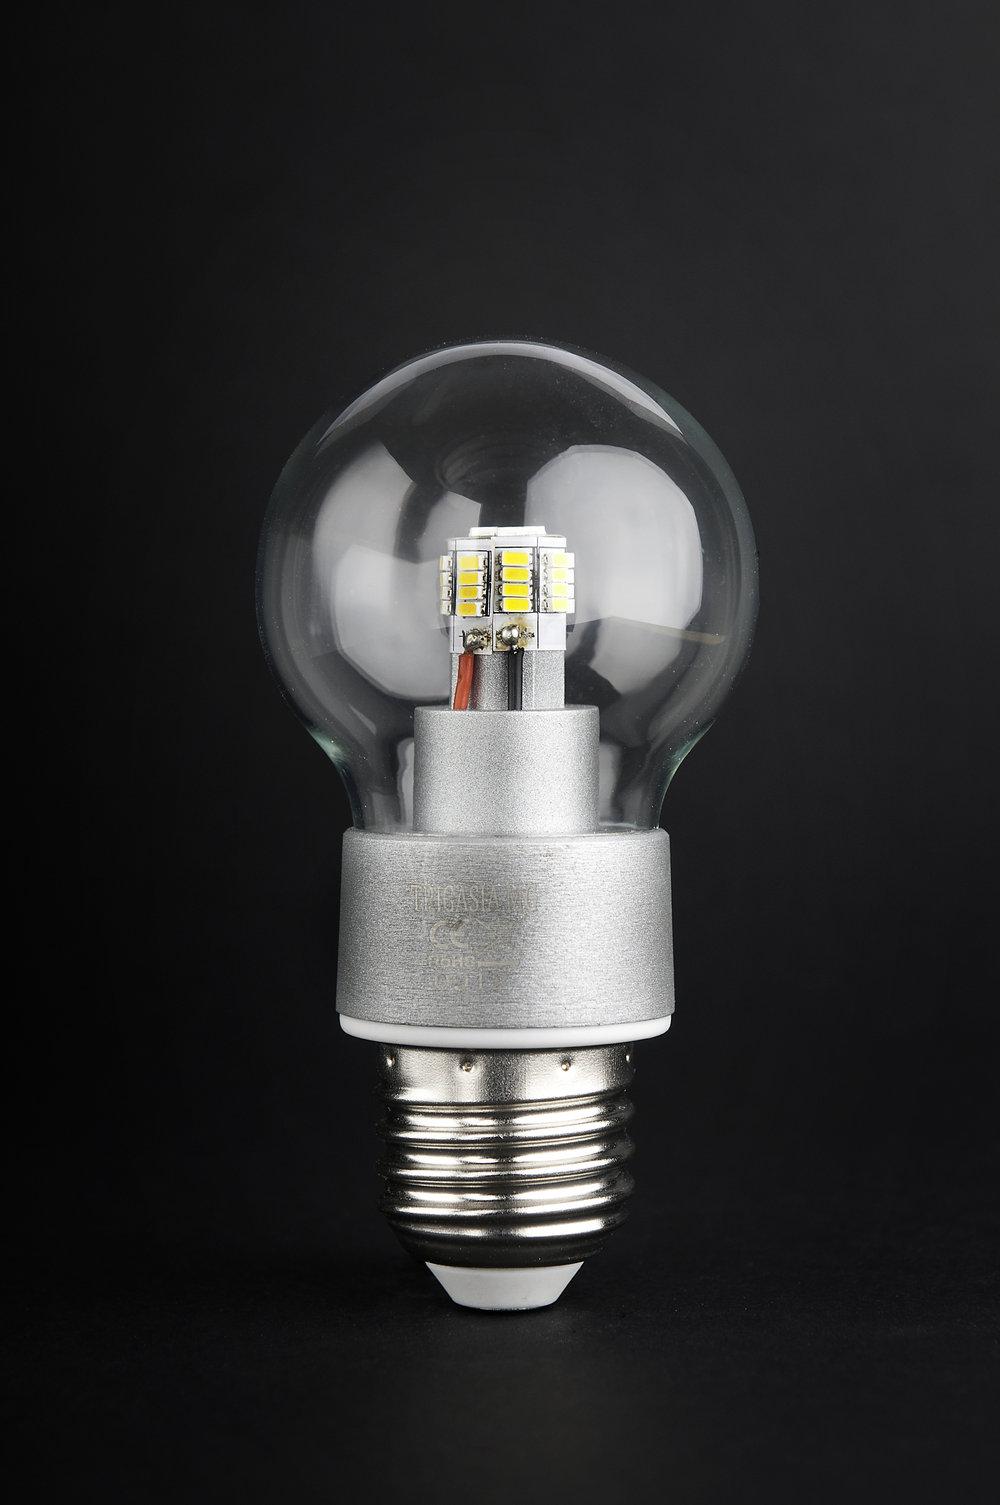 SERIE MG LED Lampadina óptica policarbonate Trasparente E27 36x 4W